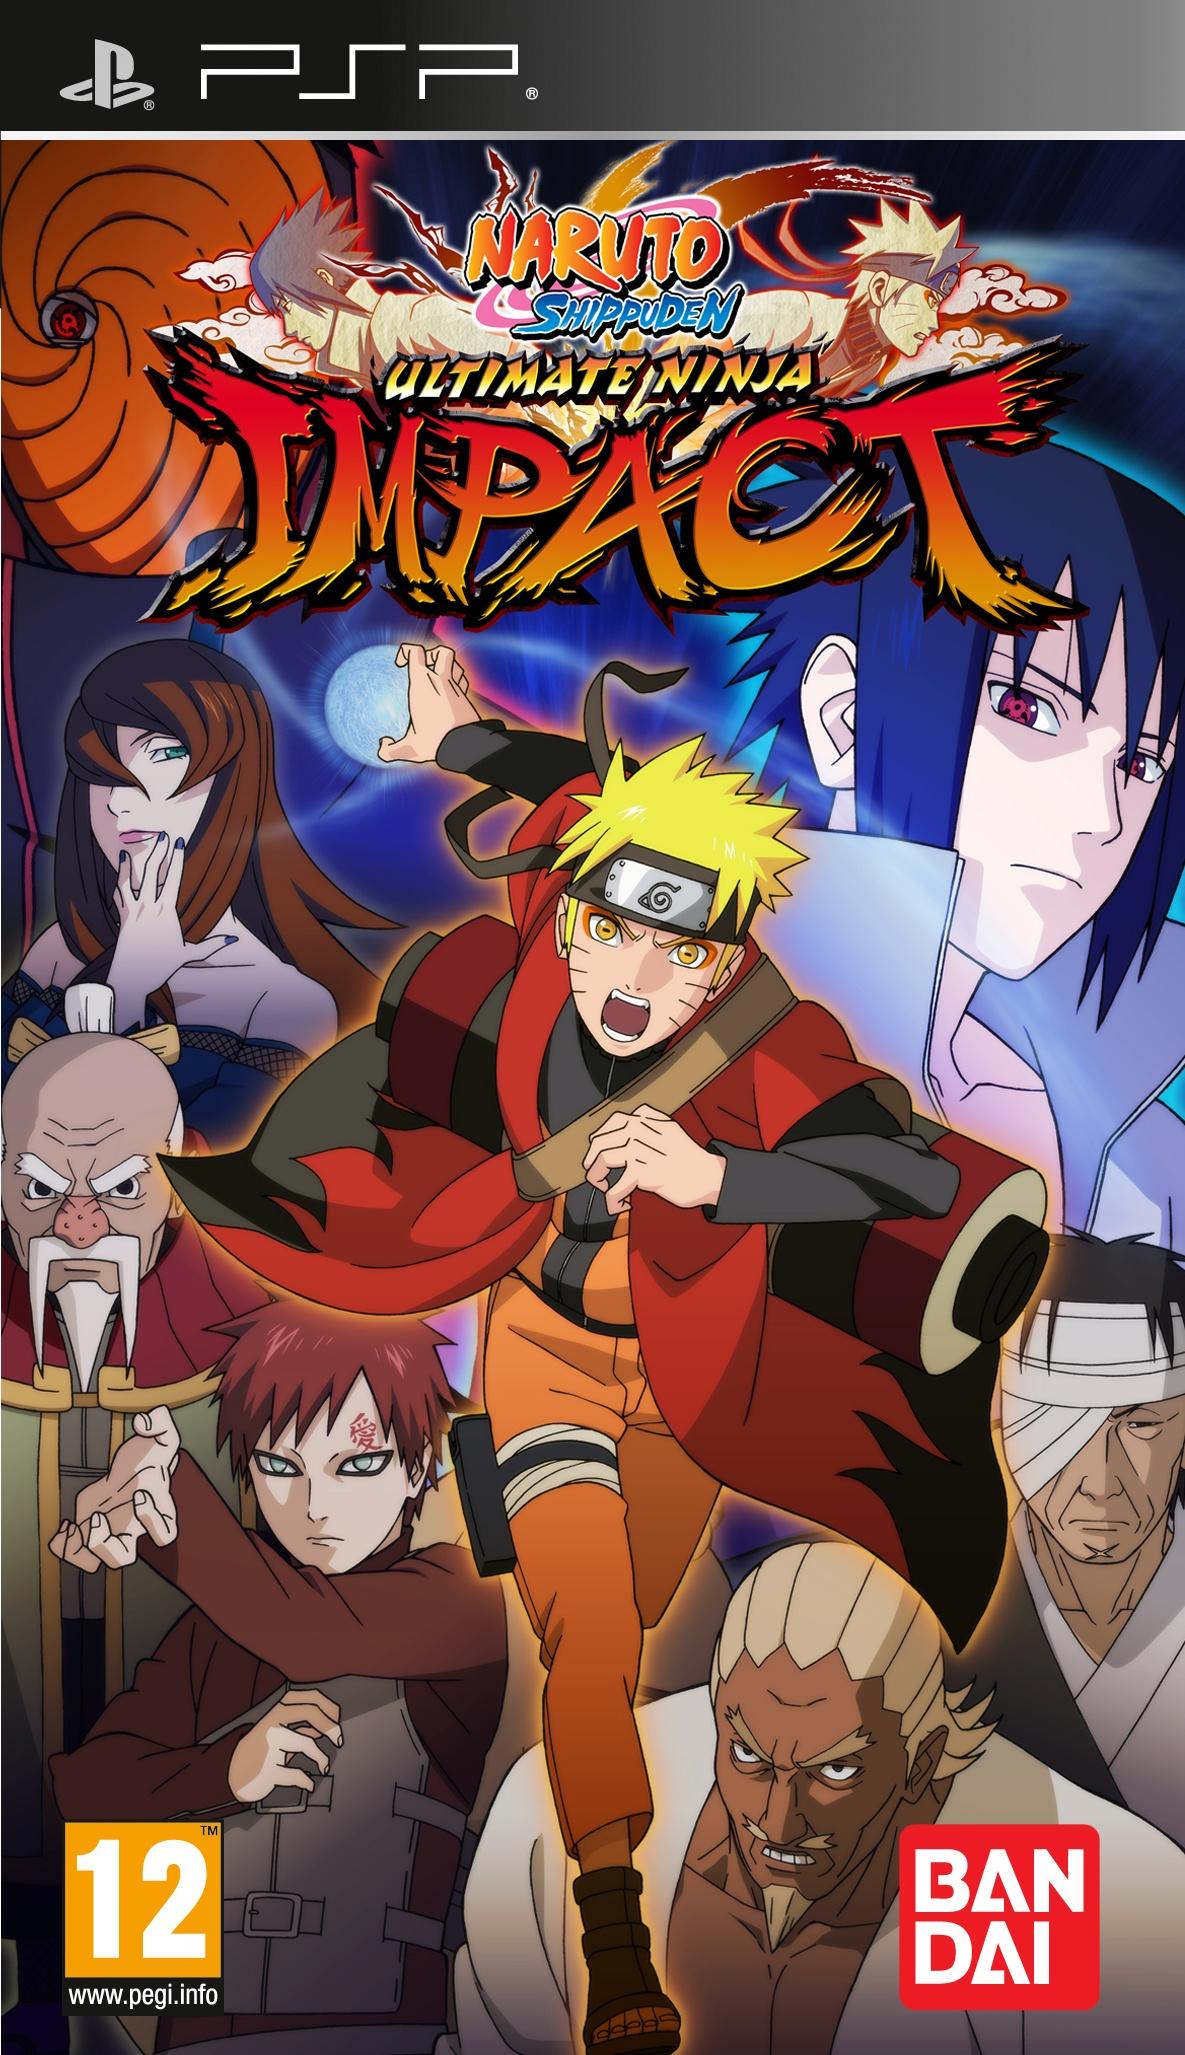 NarutoShippuden-UltimateNinjaImpact PSP Jaquette 002